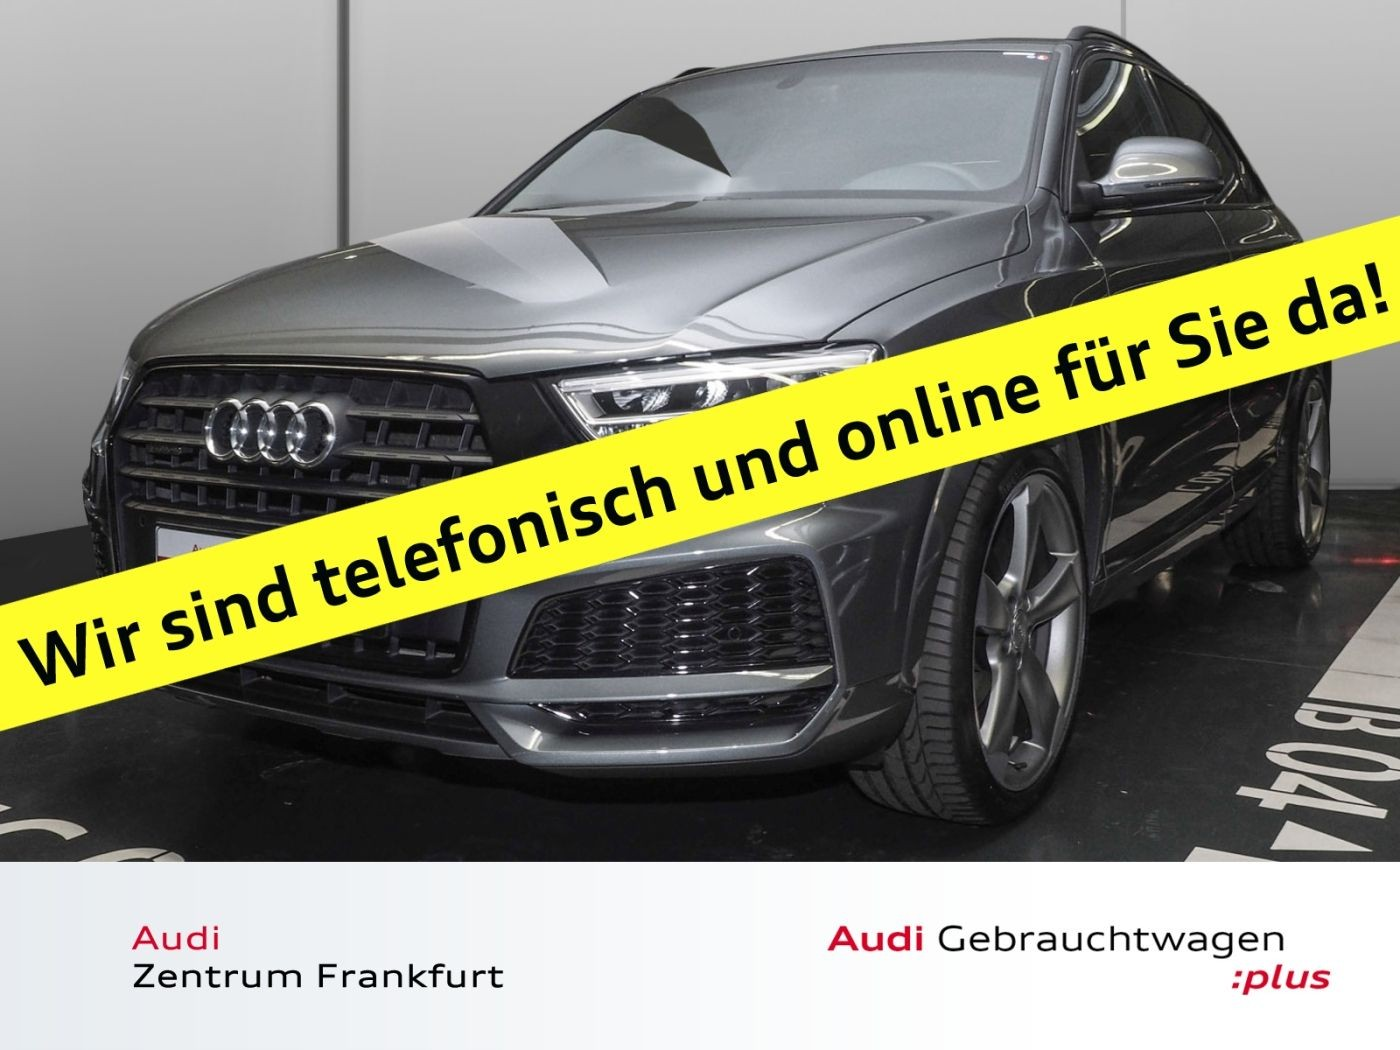 Audi Q3 2.0 TFSI quattro S tronic S line design Navi LED Sitzheizung PDC Panorama, Jahr 2017, Benzin